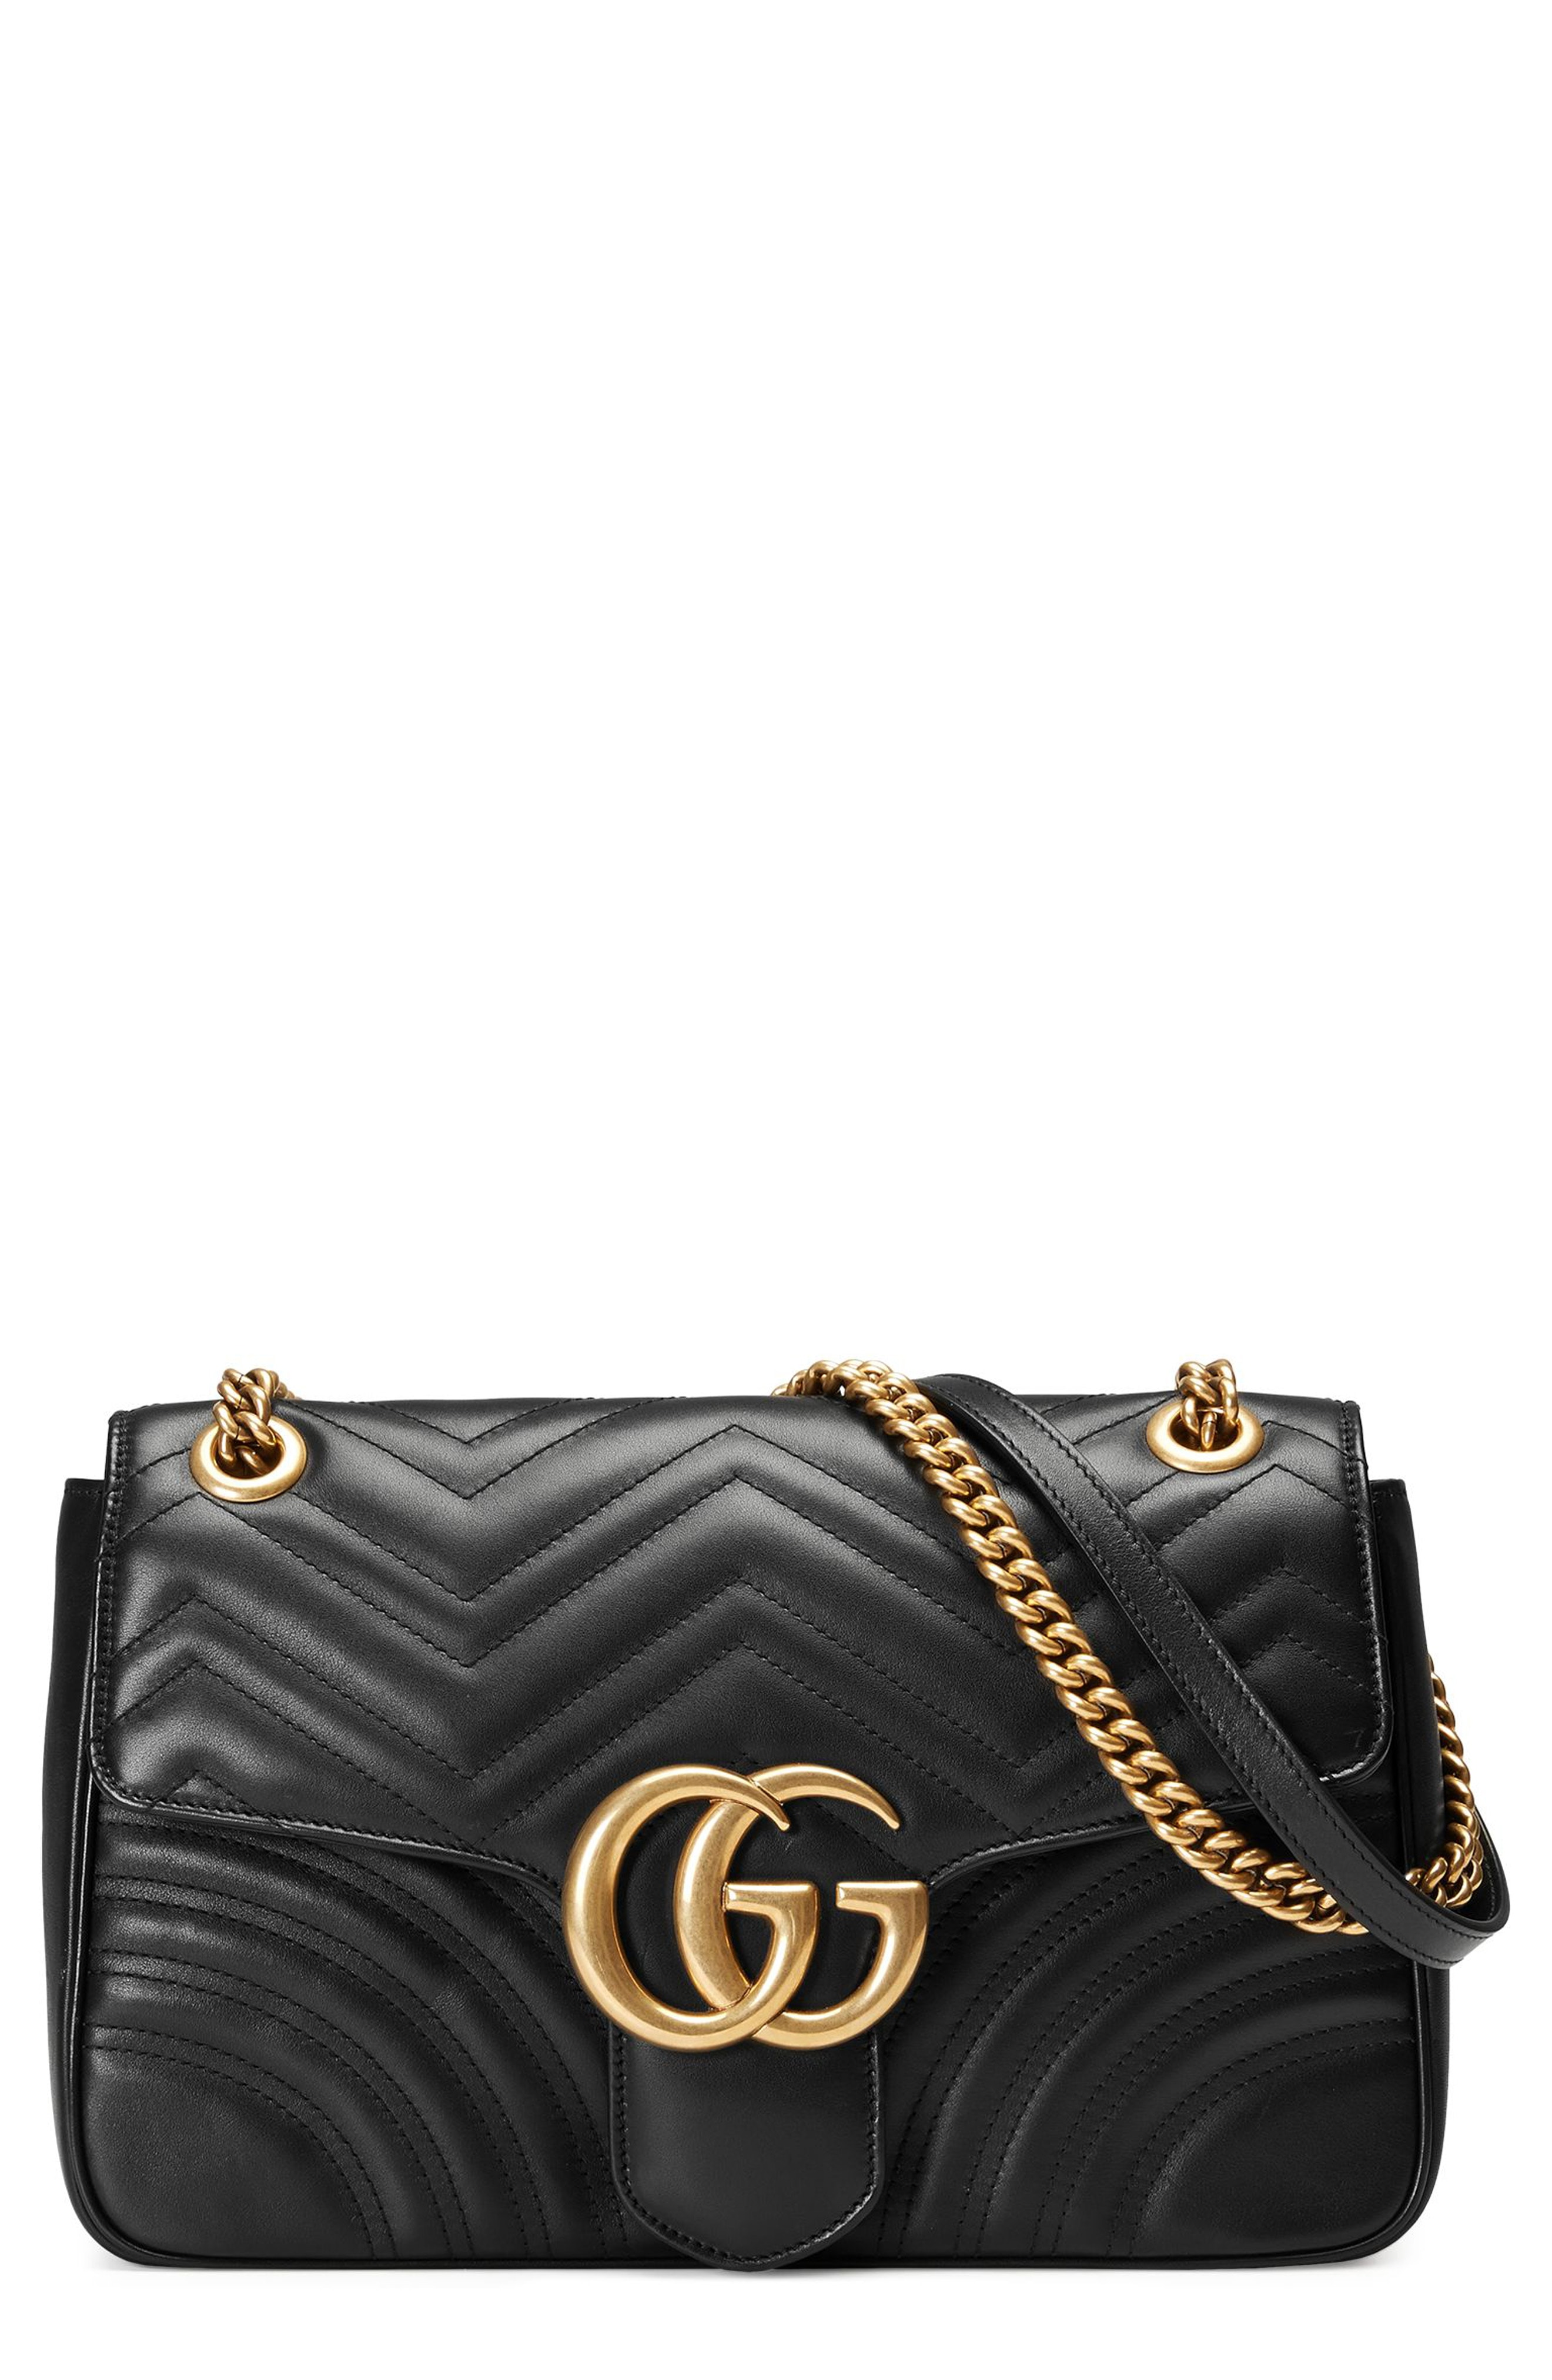 Gucci Medium GG Marmont 2.0 Matelass Leather Shoulder Bag